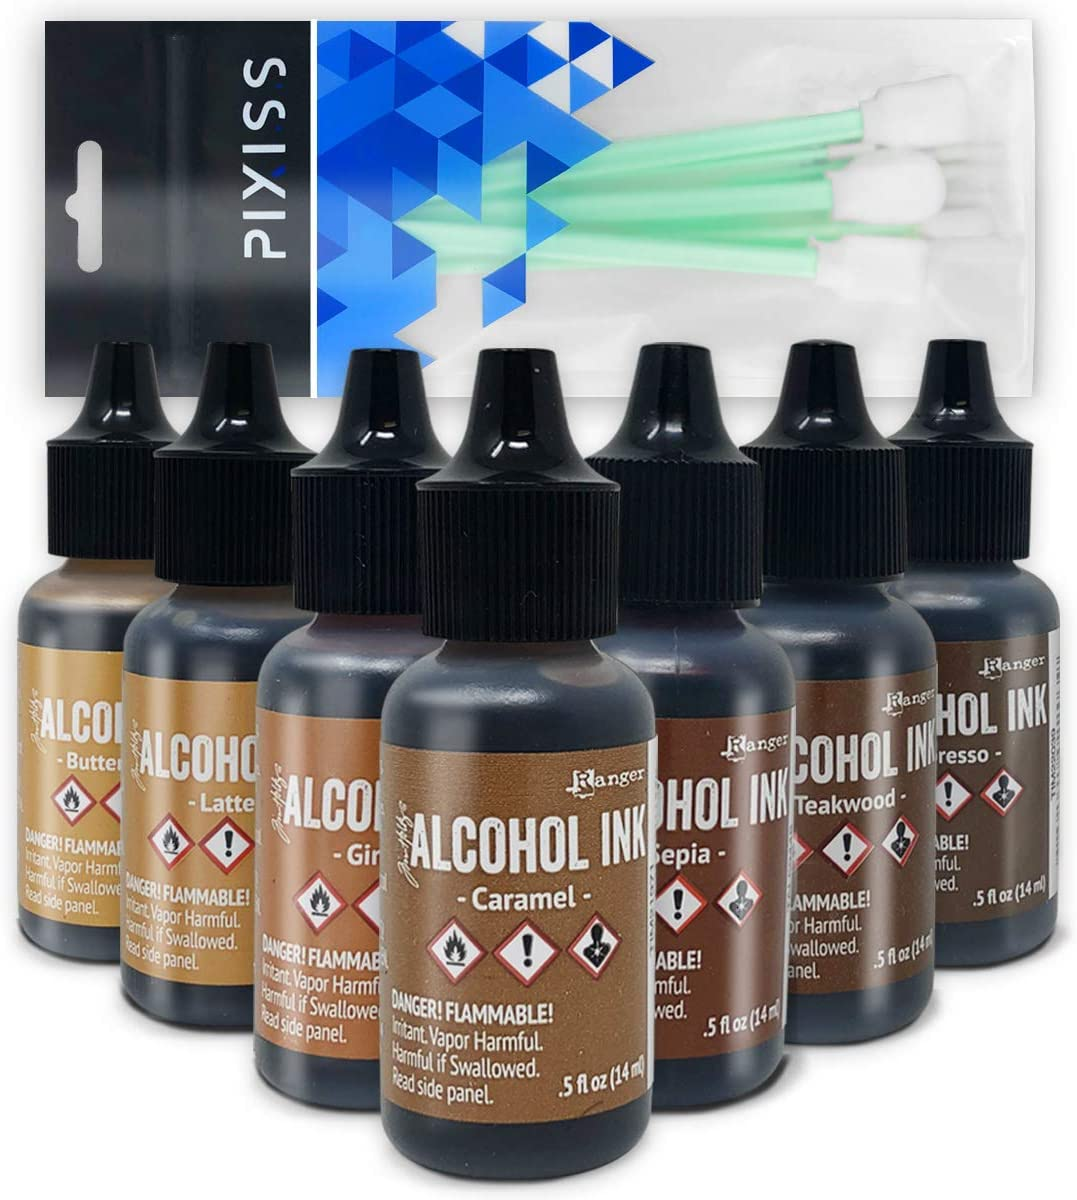 Brown Alcohol Inks Set | Tim Holtz Alcohol Inks Shades of Brown 7-Pack | Teakwood, Espresso, Latte, Ginger, Caramel, Sepia, Butterscotch | 10 Pixiss Alcohol Ink Blending Tools